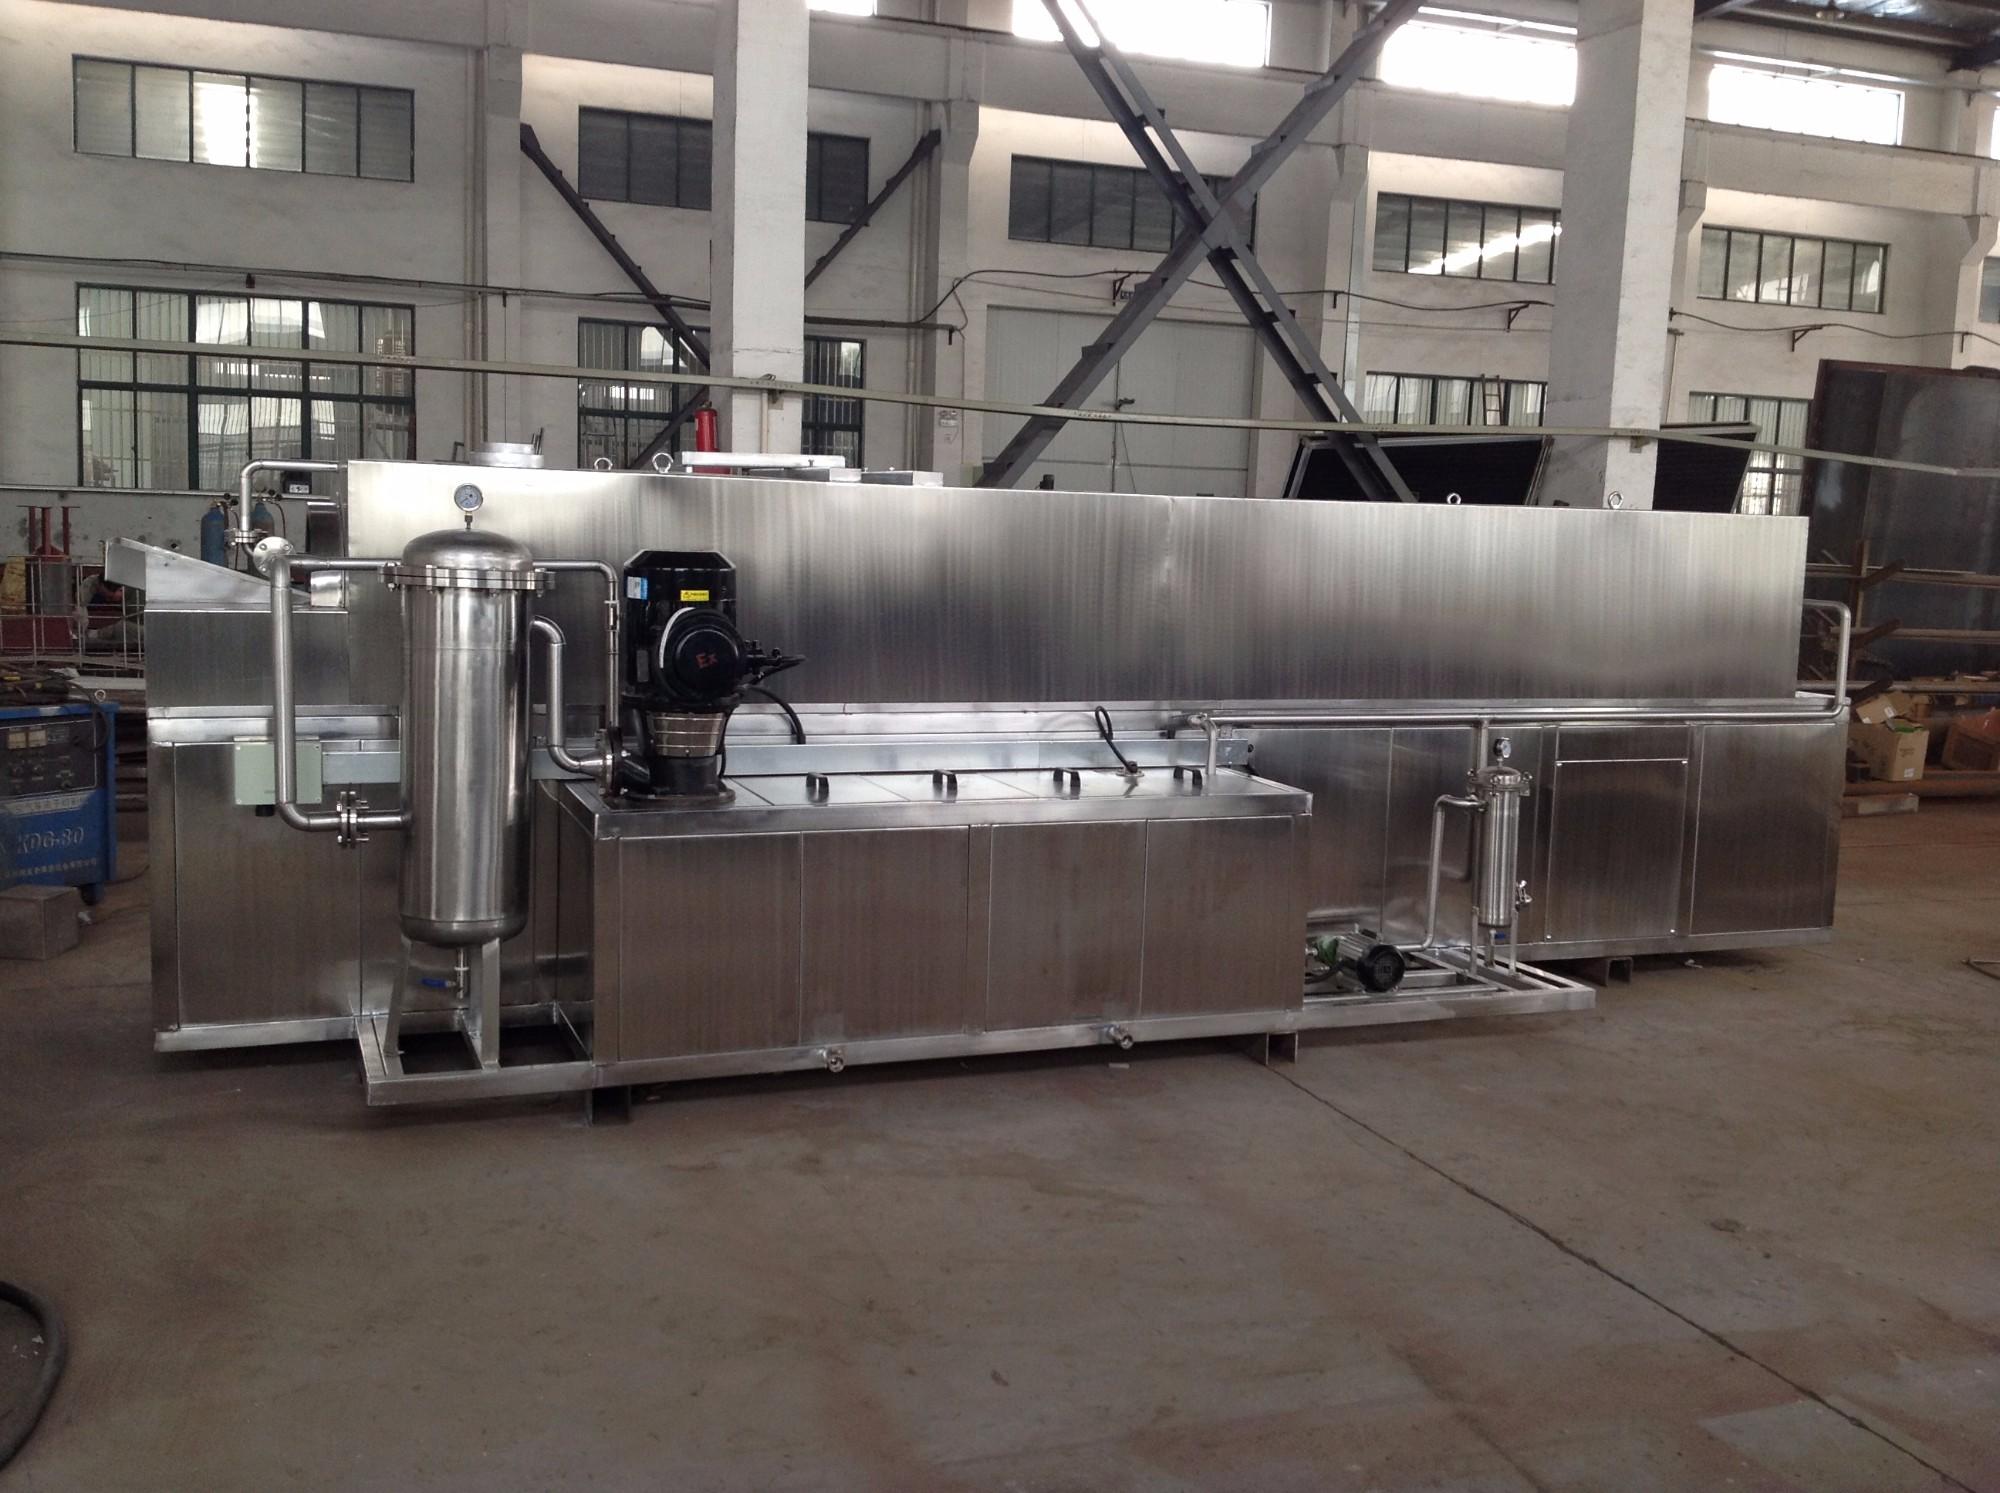 Pressure Washer Manufacturers, Pressure Washer Factory, Supply Pressure Washer